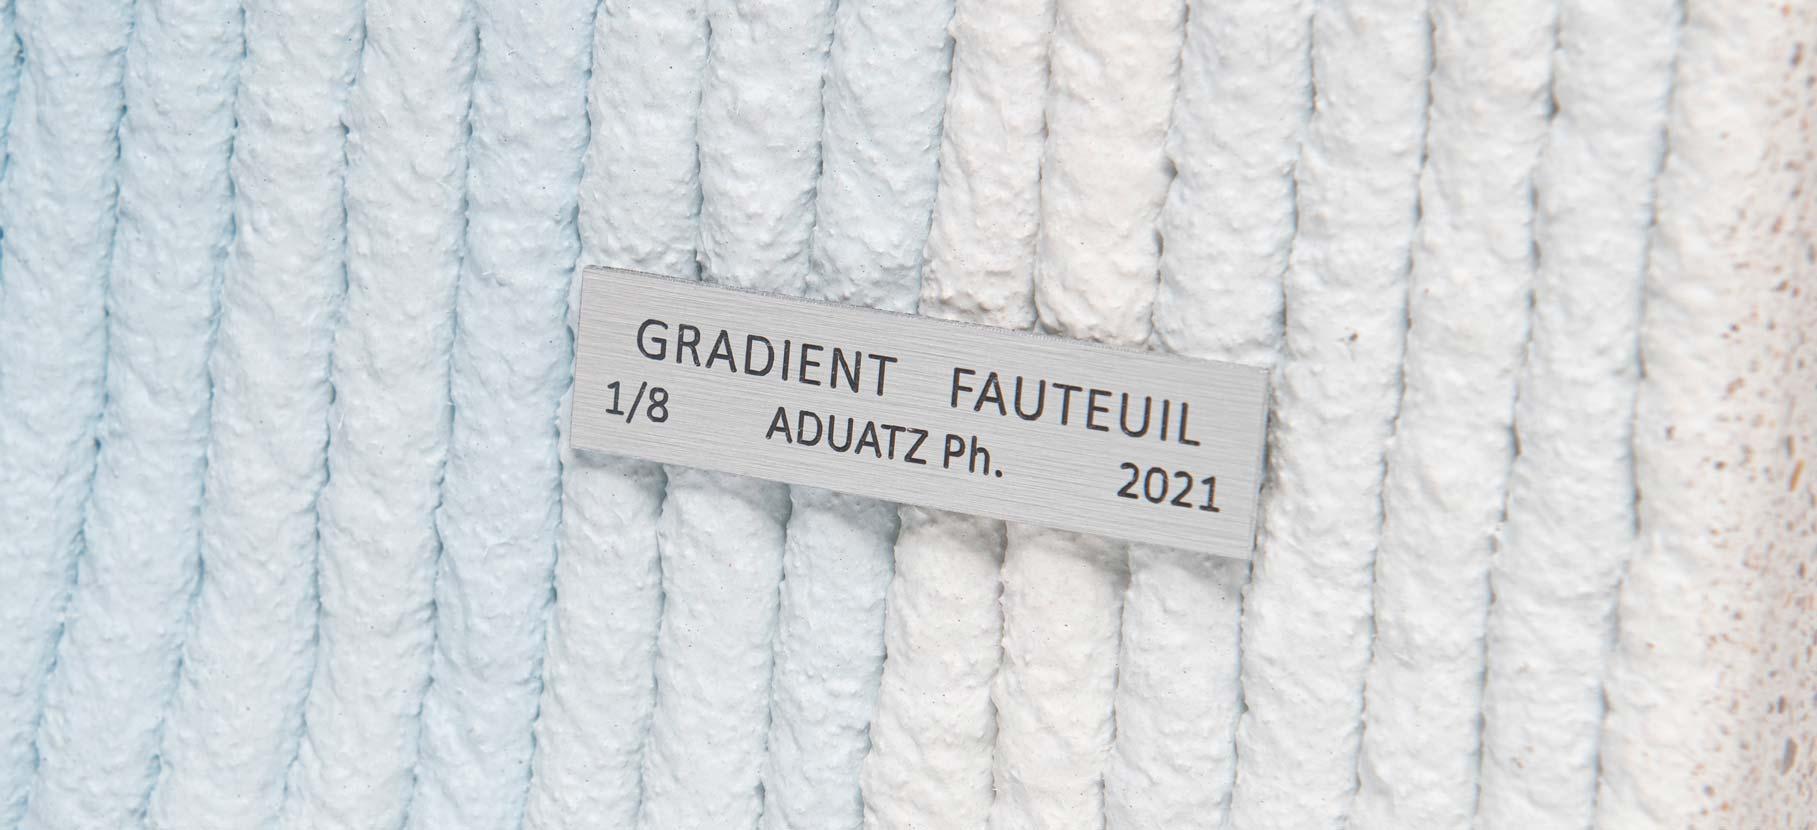 Gradient_Fauteuil_12